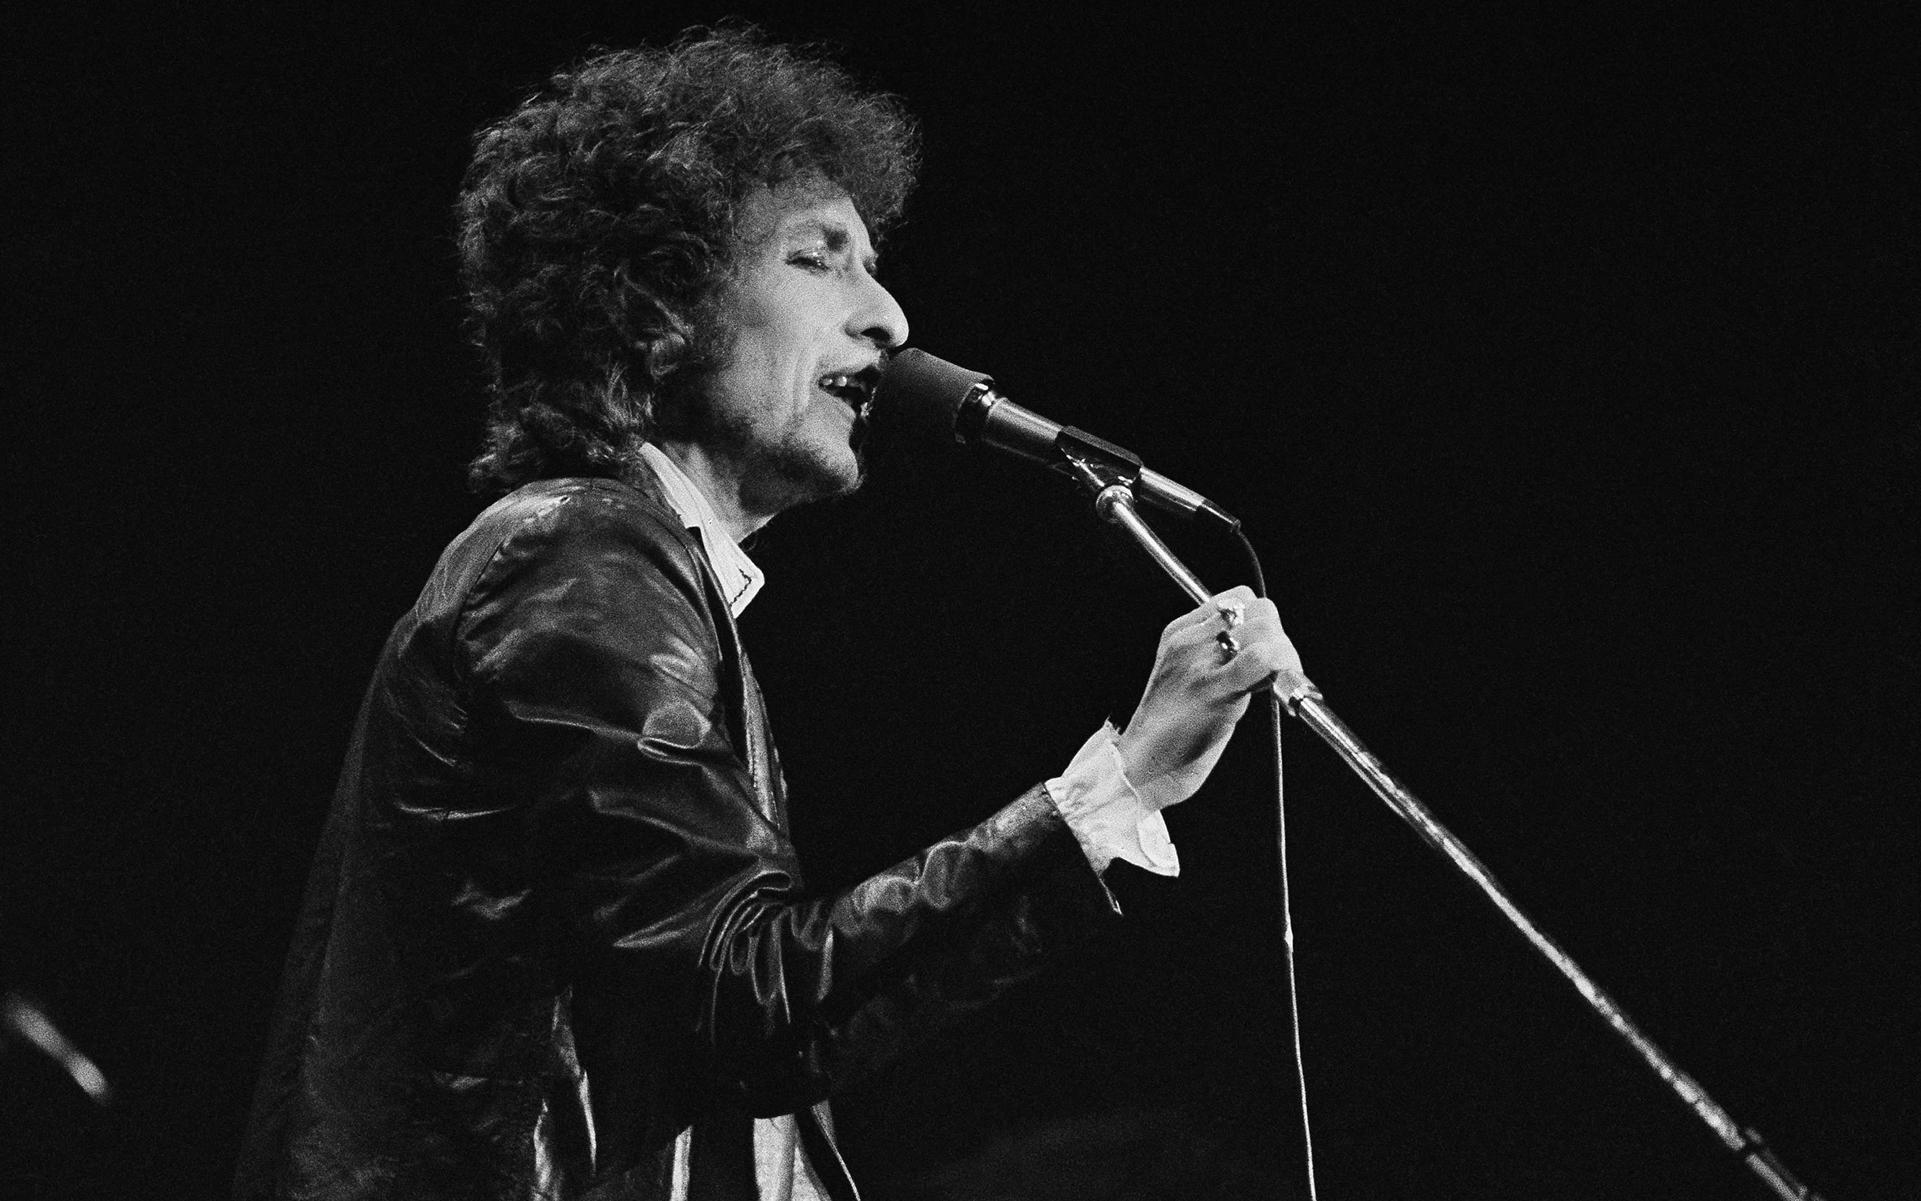 How Cannabis Influenced Bob Dylan's Musical Career